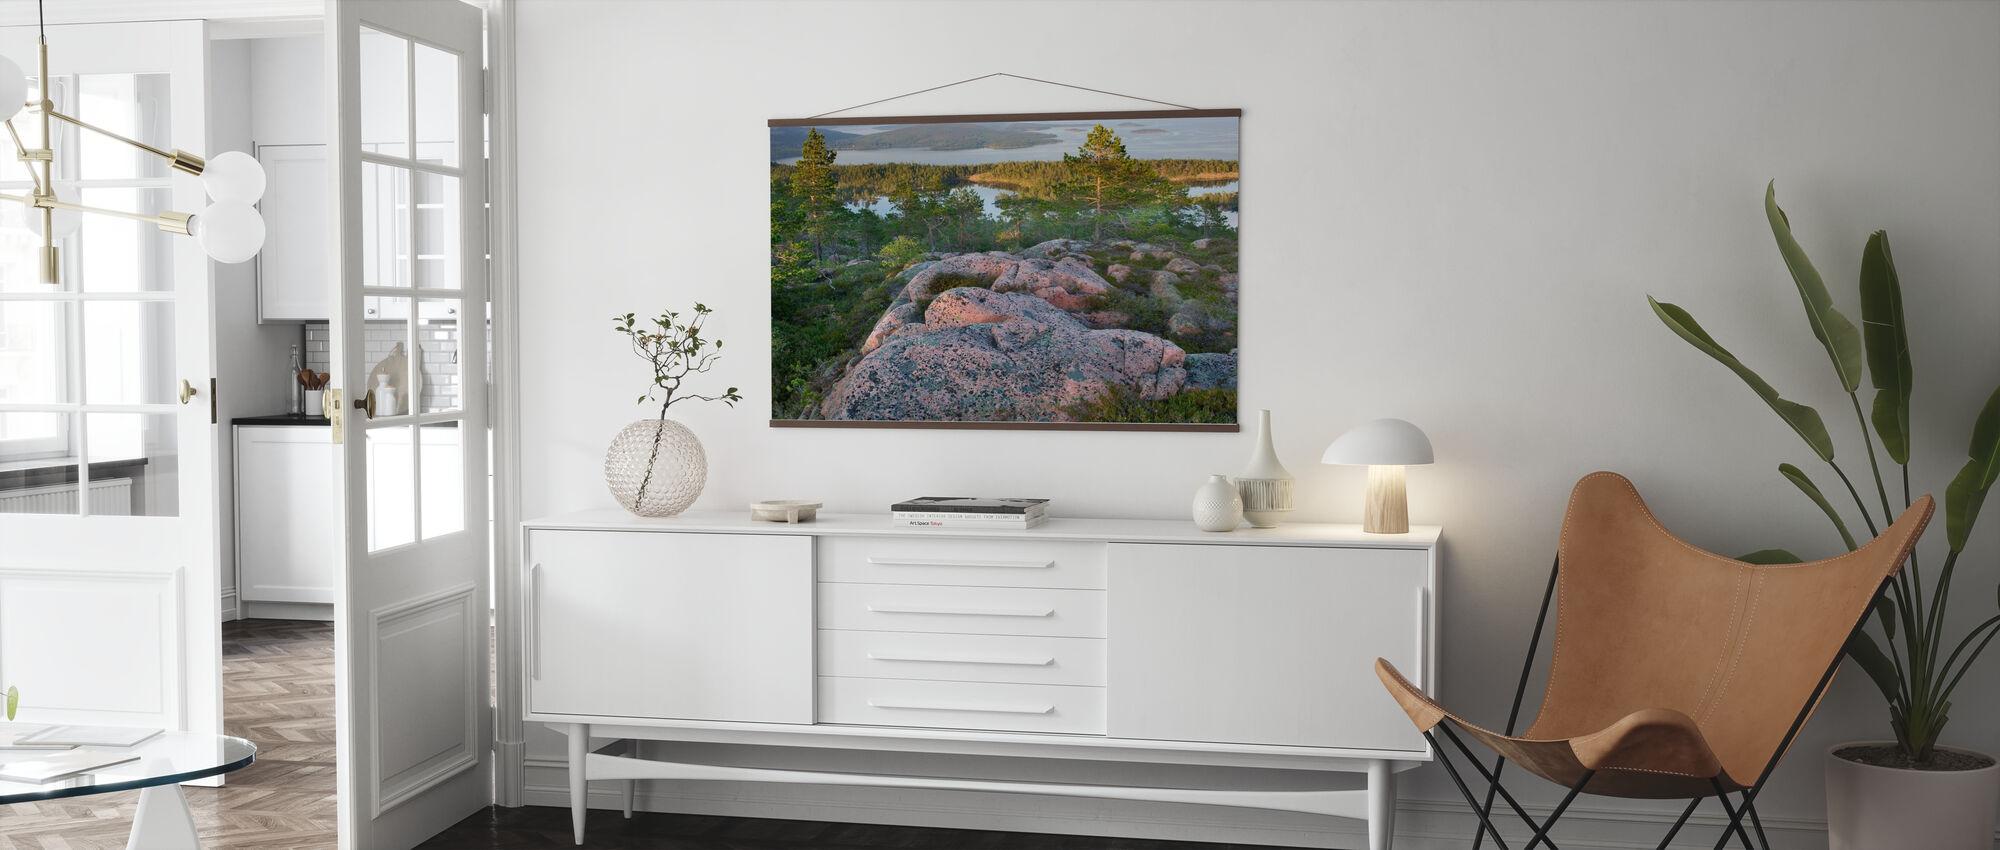 Skuleskogen National Park, Sverige - Poster - Vardagsrum